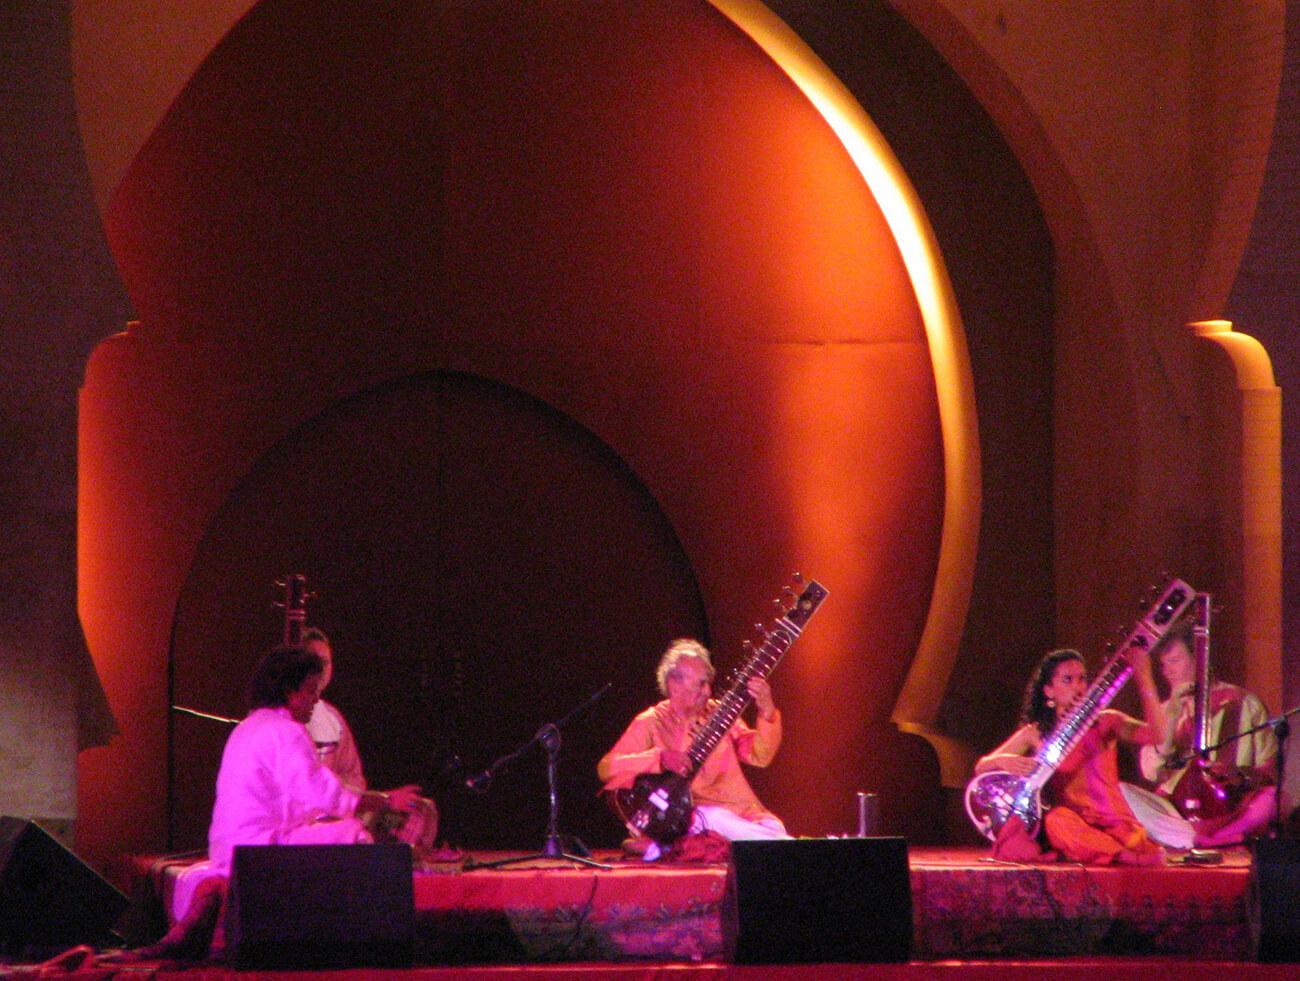 Sahara Desert Tour - Festivals: Discover a More Intimate Side of Morocco - Fes Sacred World Music Festival